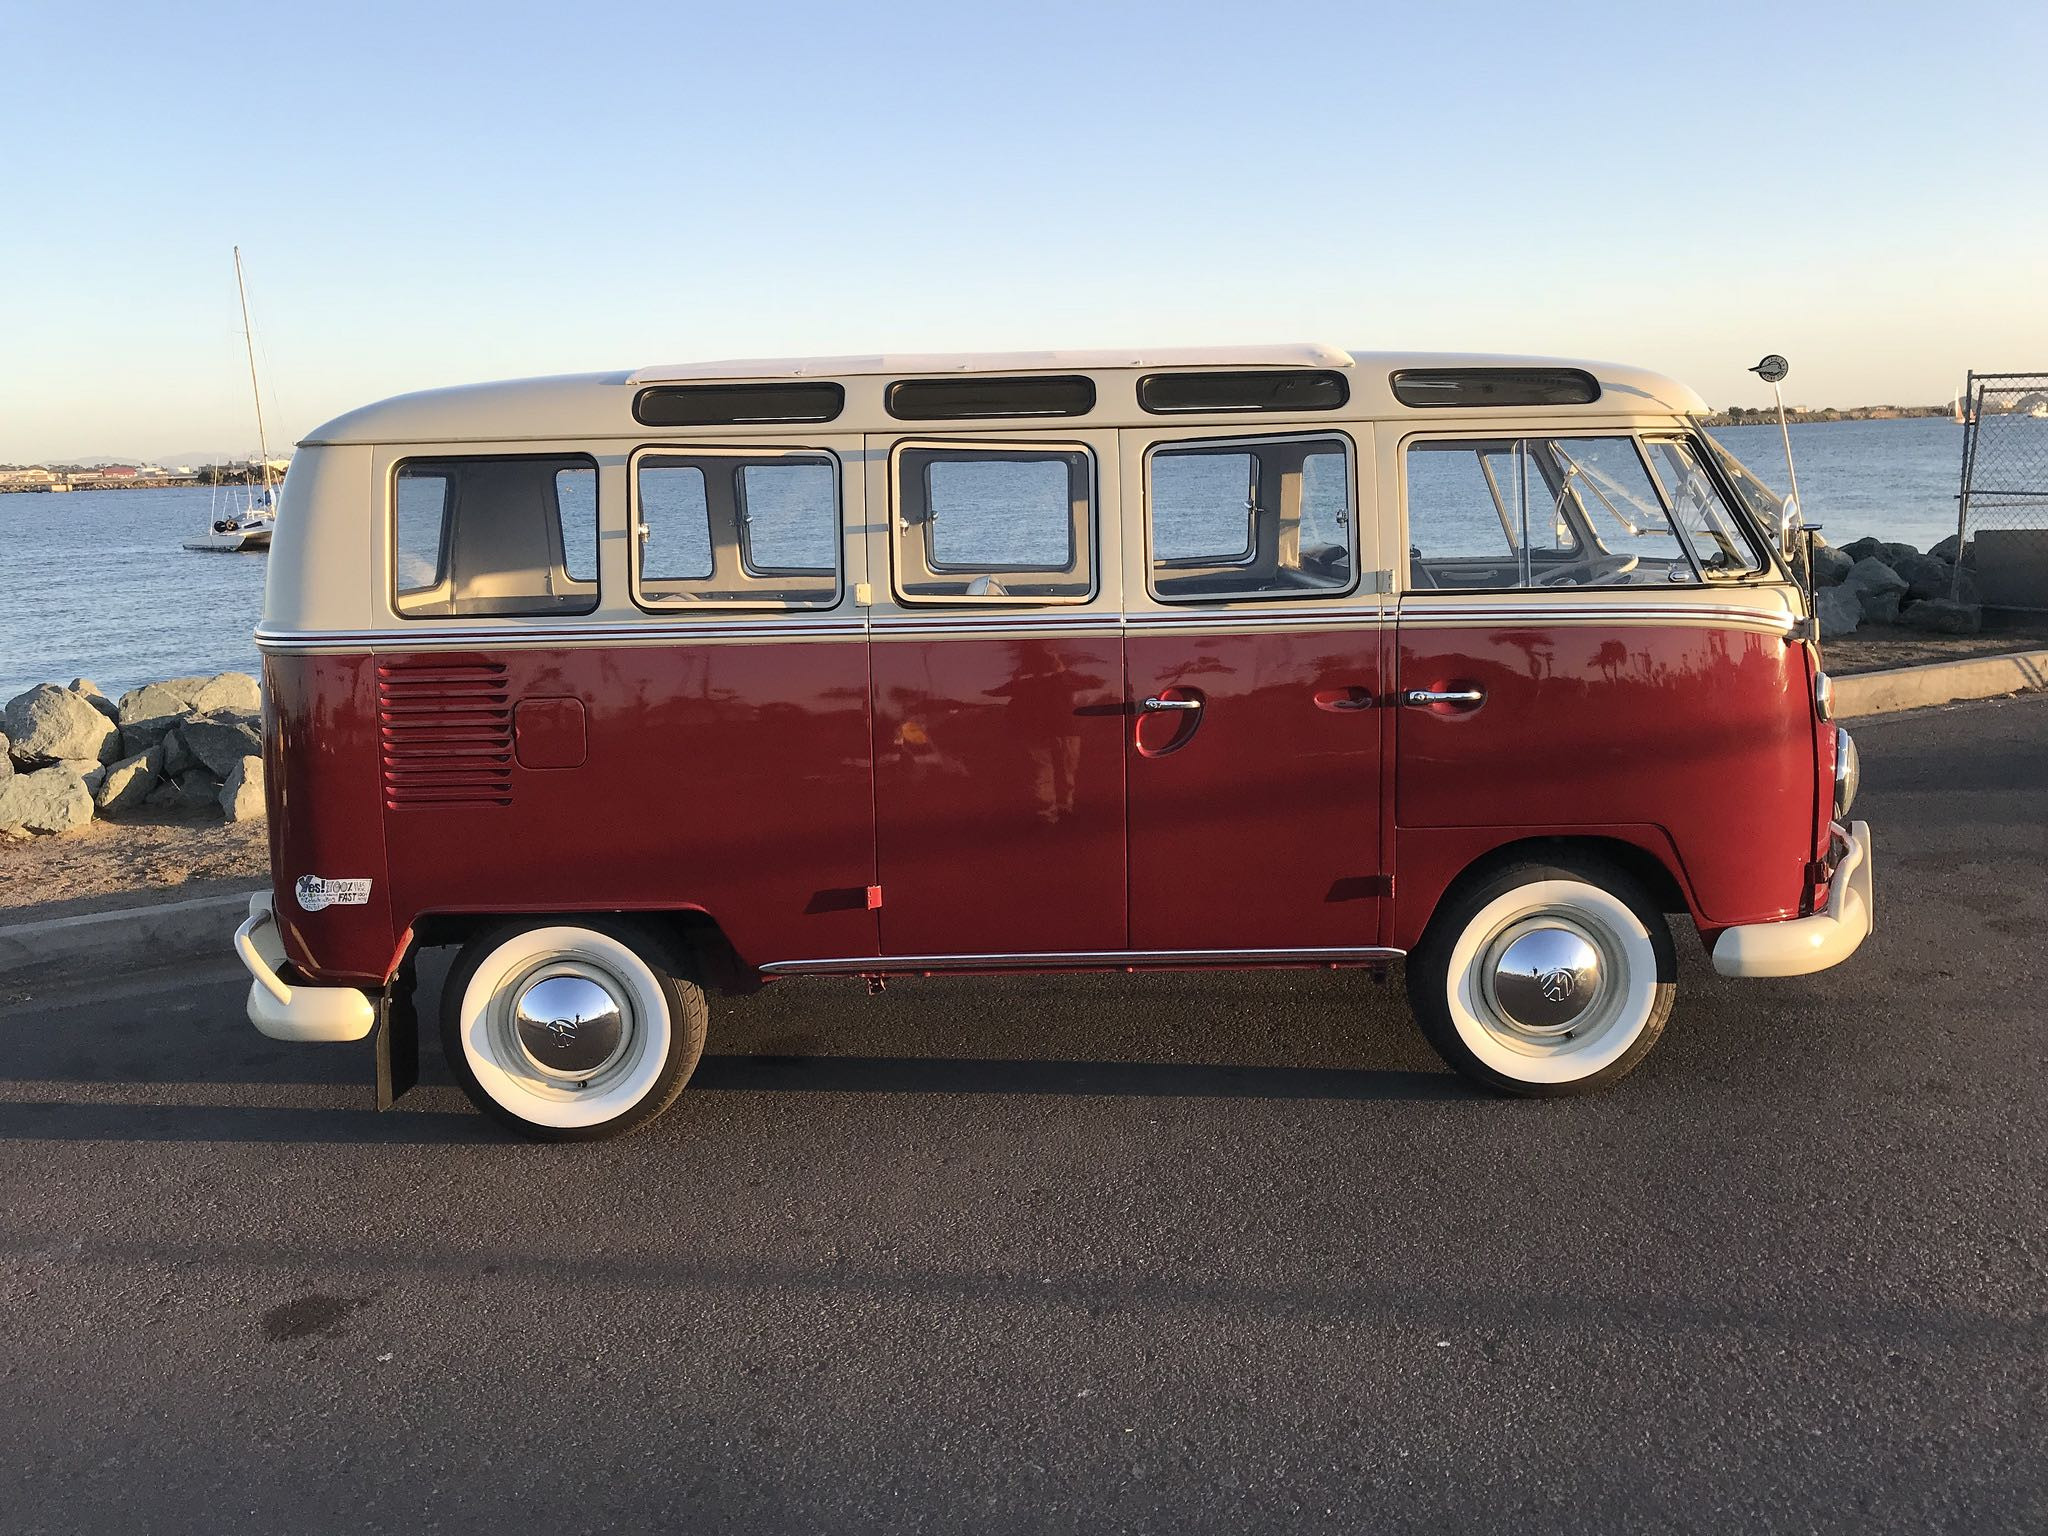 1958 Volkswagen 21 Window Bus EV conversion side view